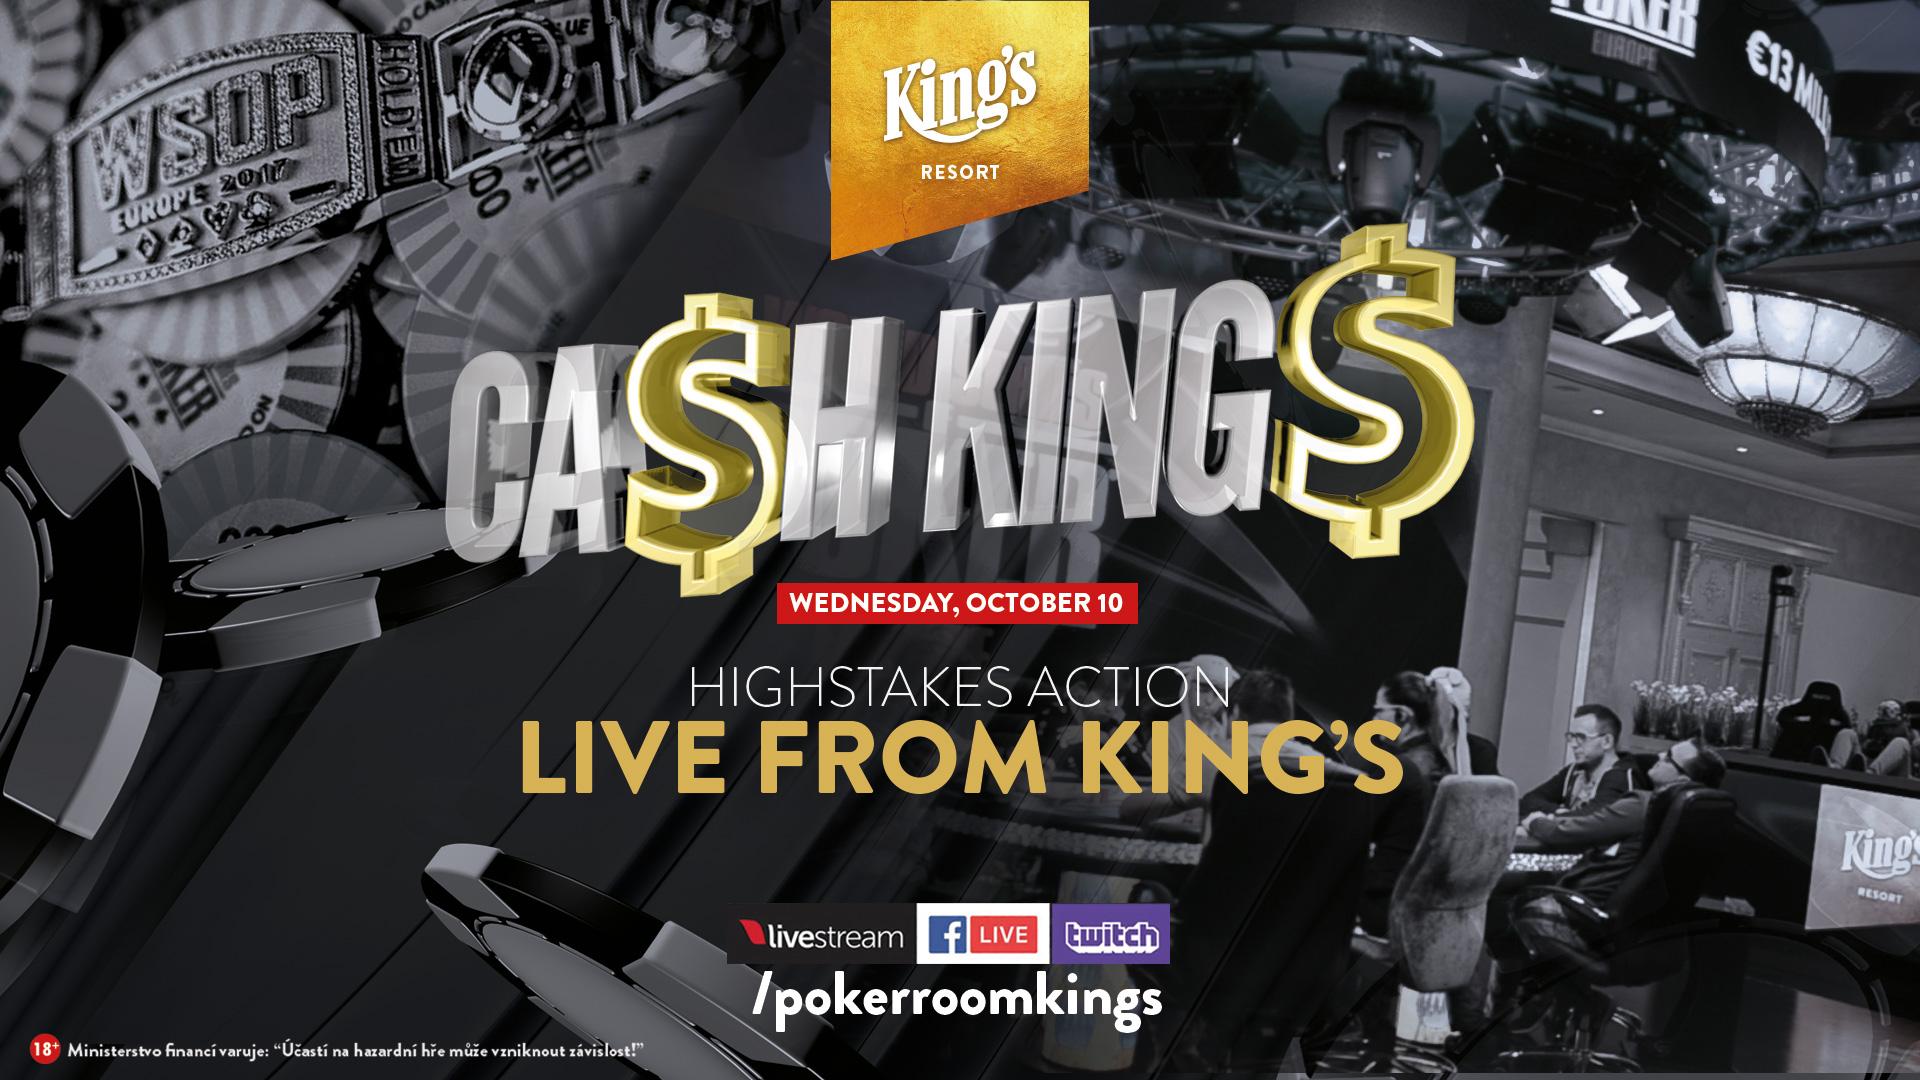 cashkings-wed